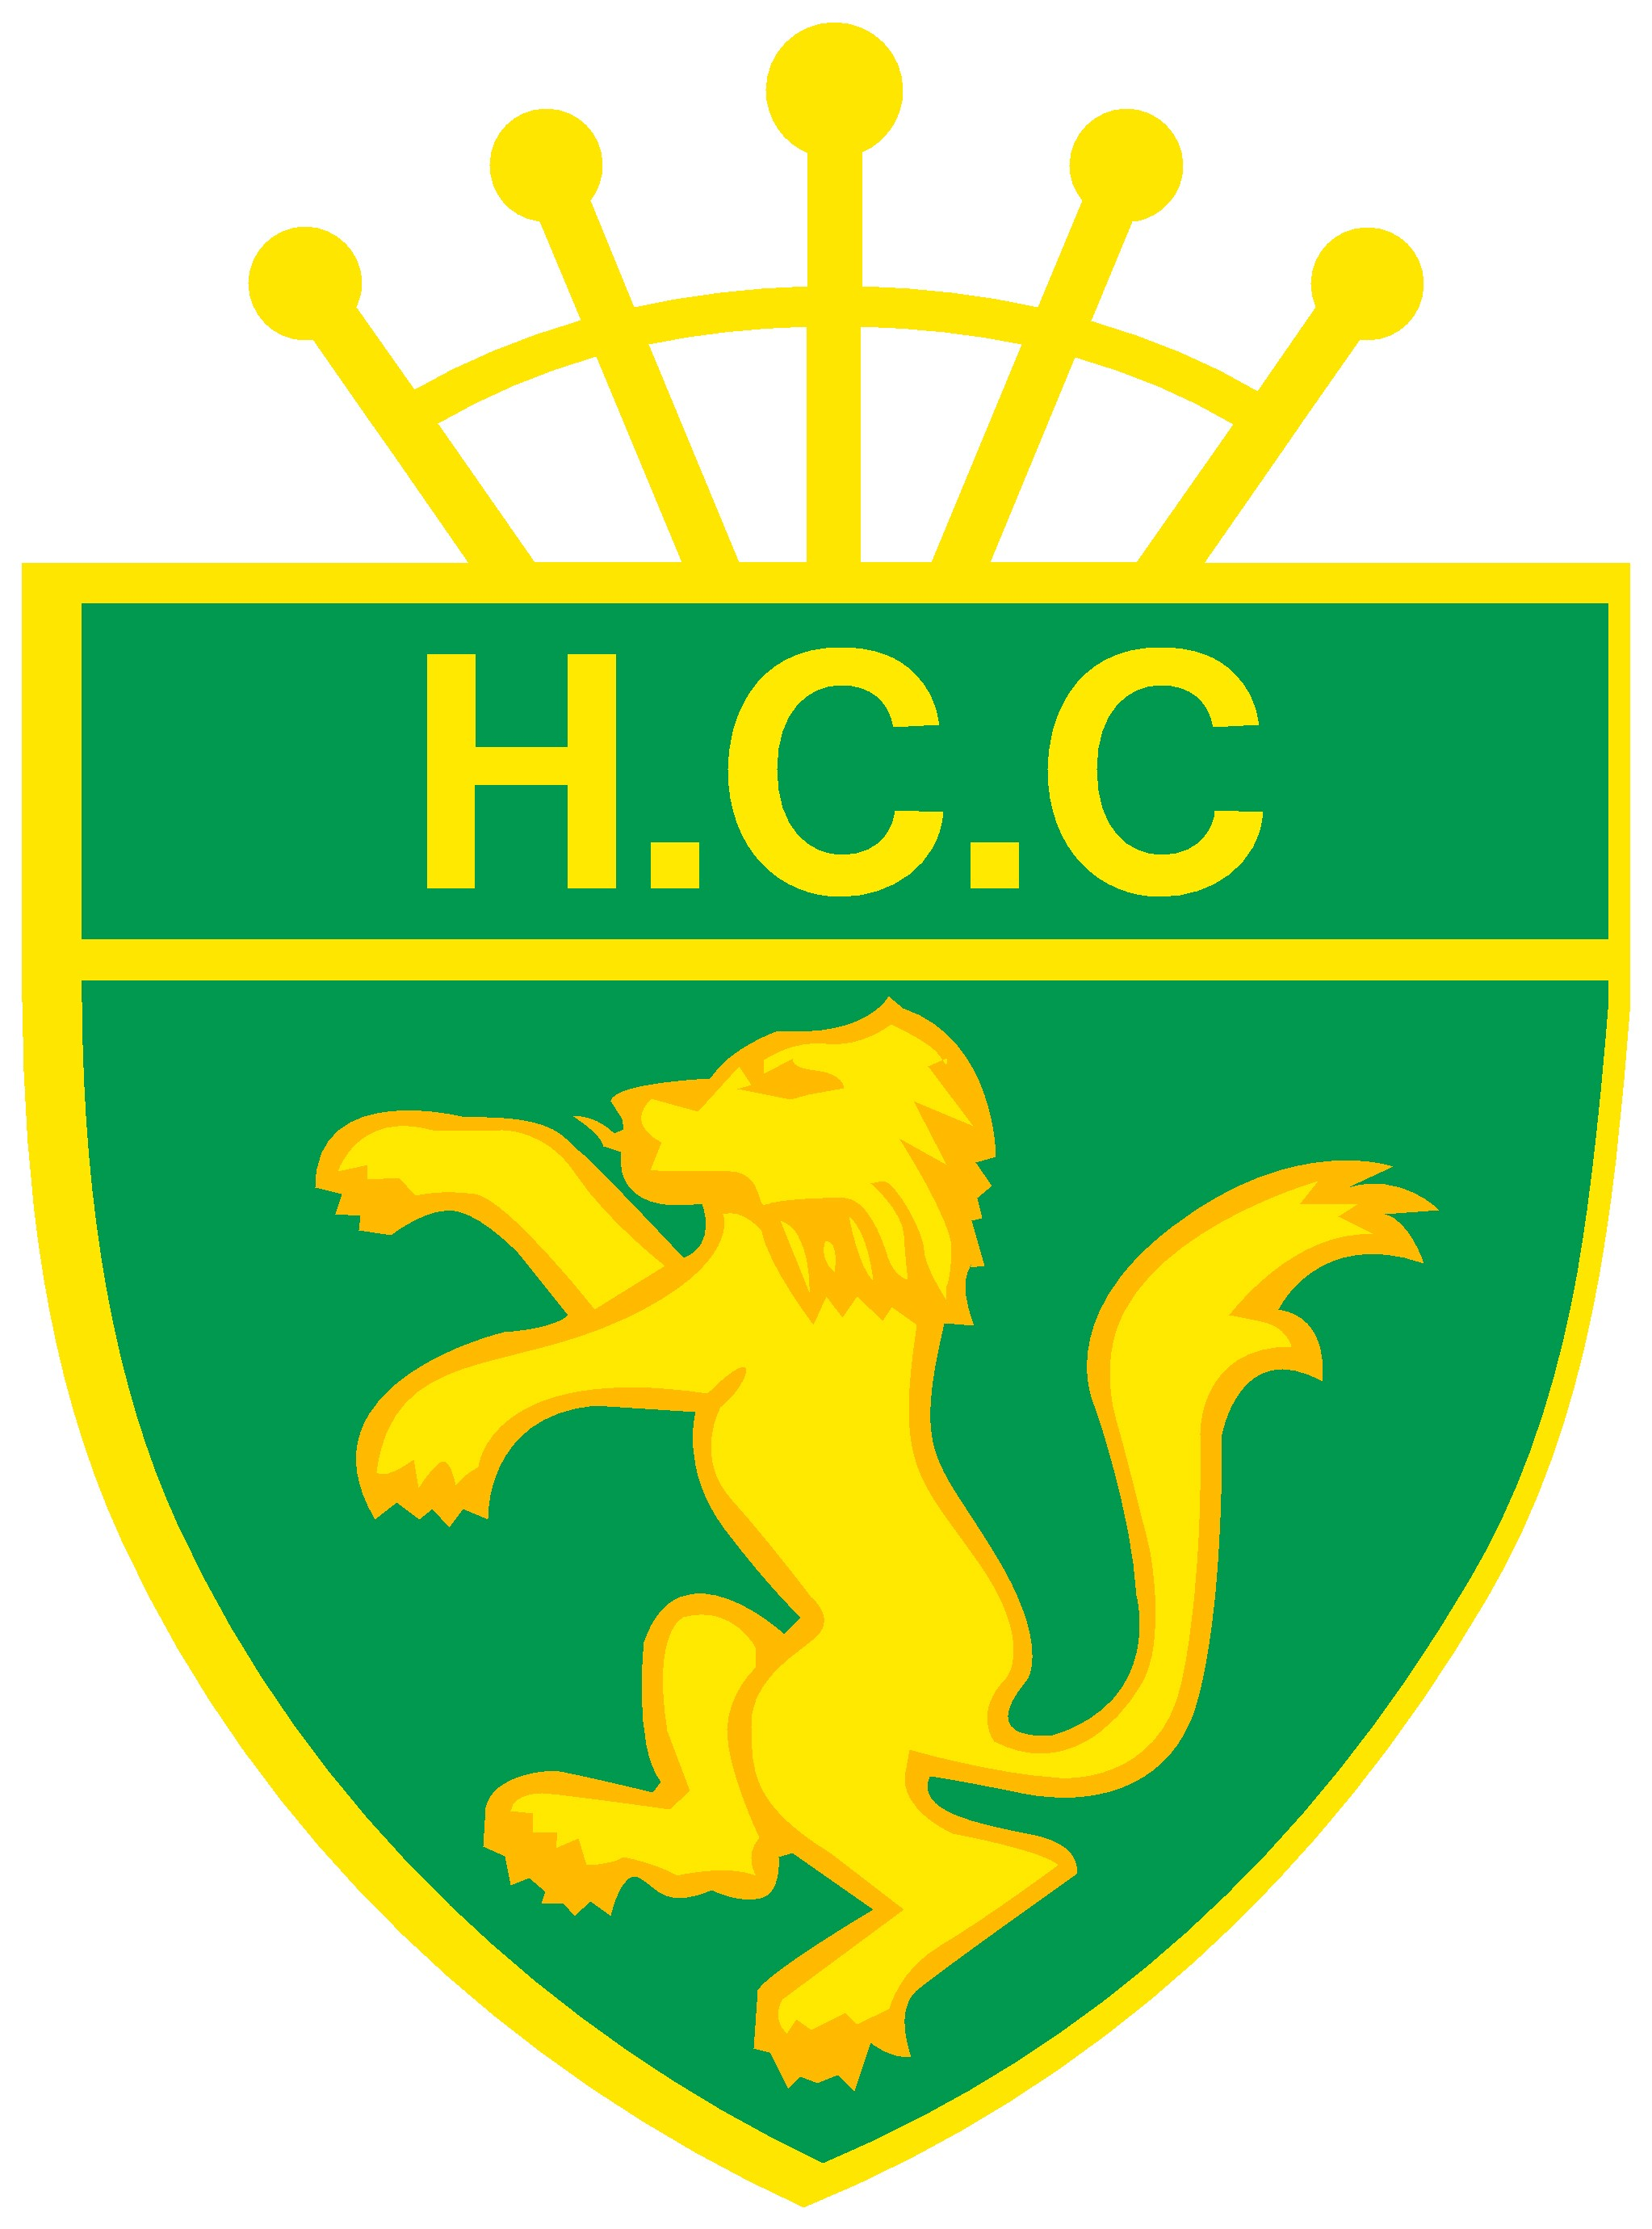 30370_-_Hallam_CC_logo_JPEG